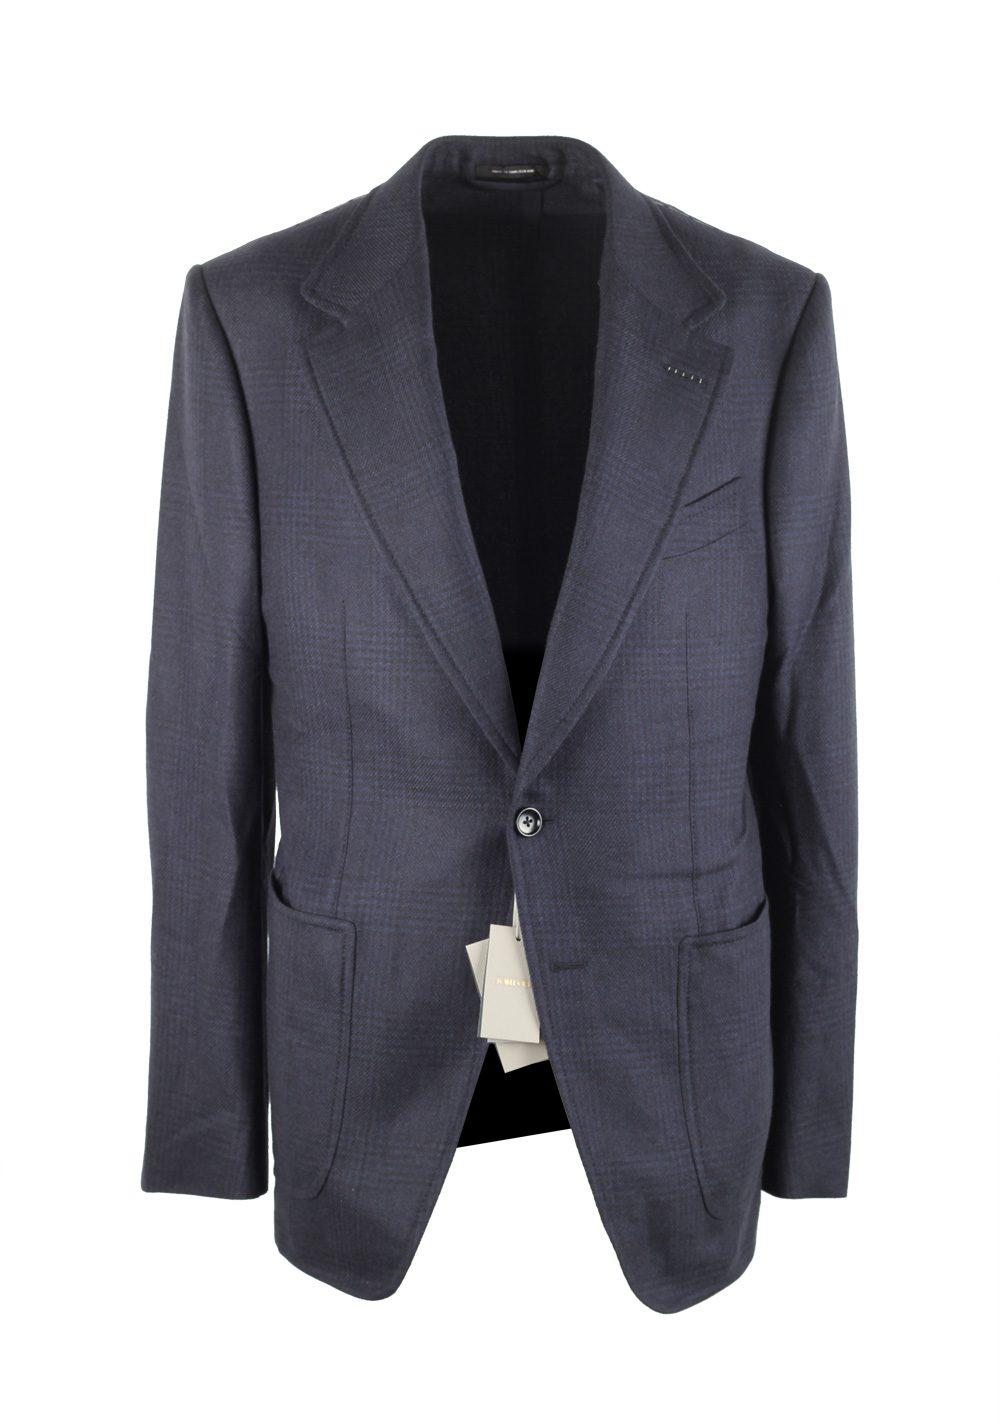 TOM FORD Shelton Blue Checked Sport Coat Size 54L / 44L U.S. | Costume Limité